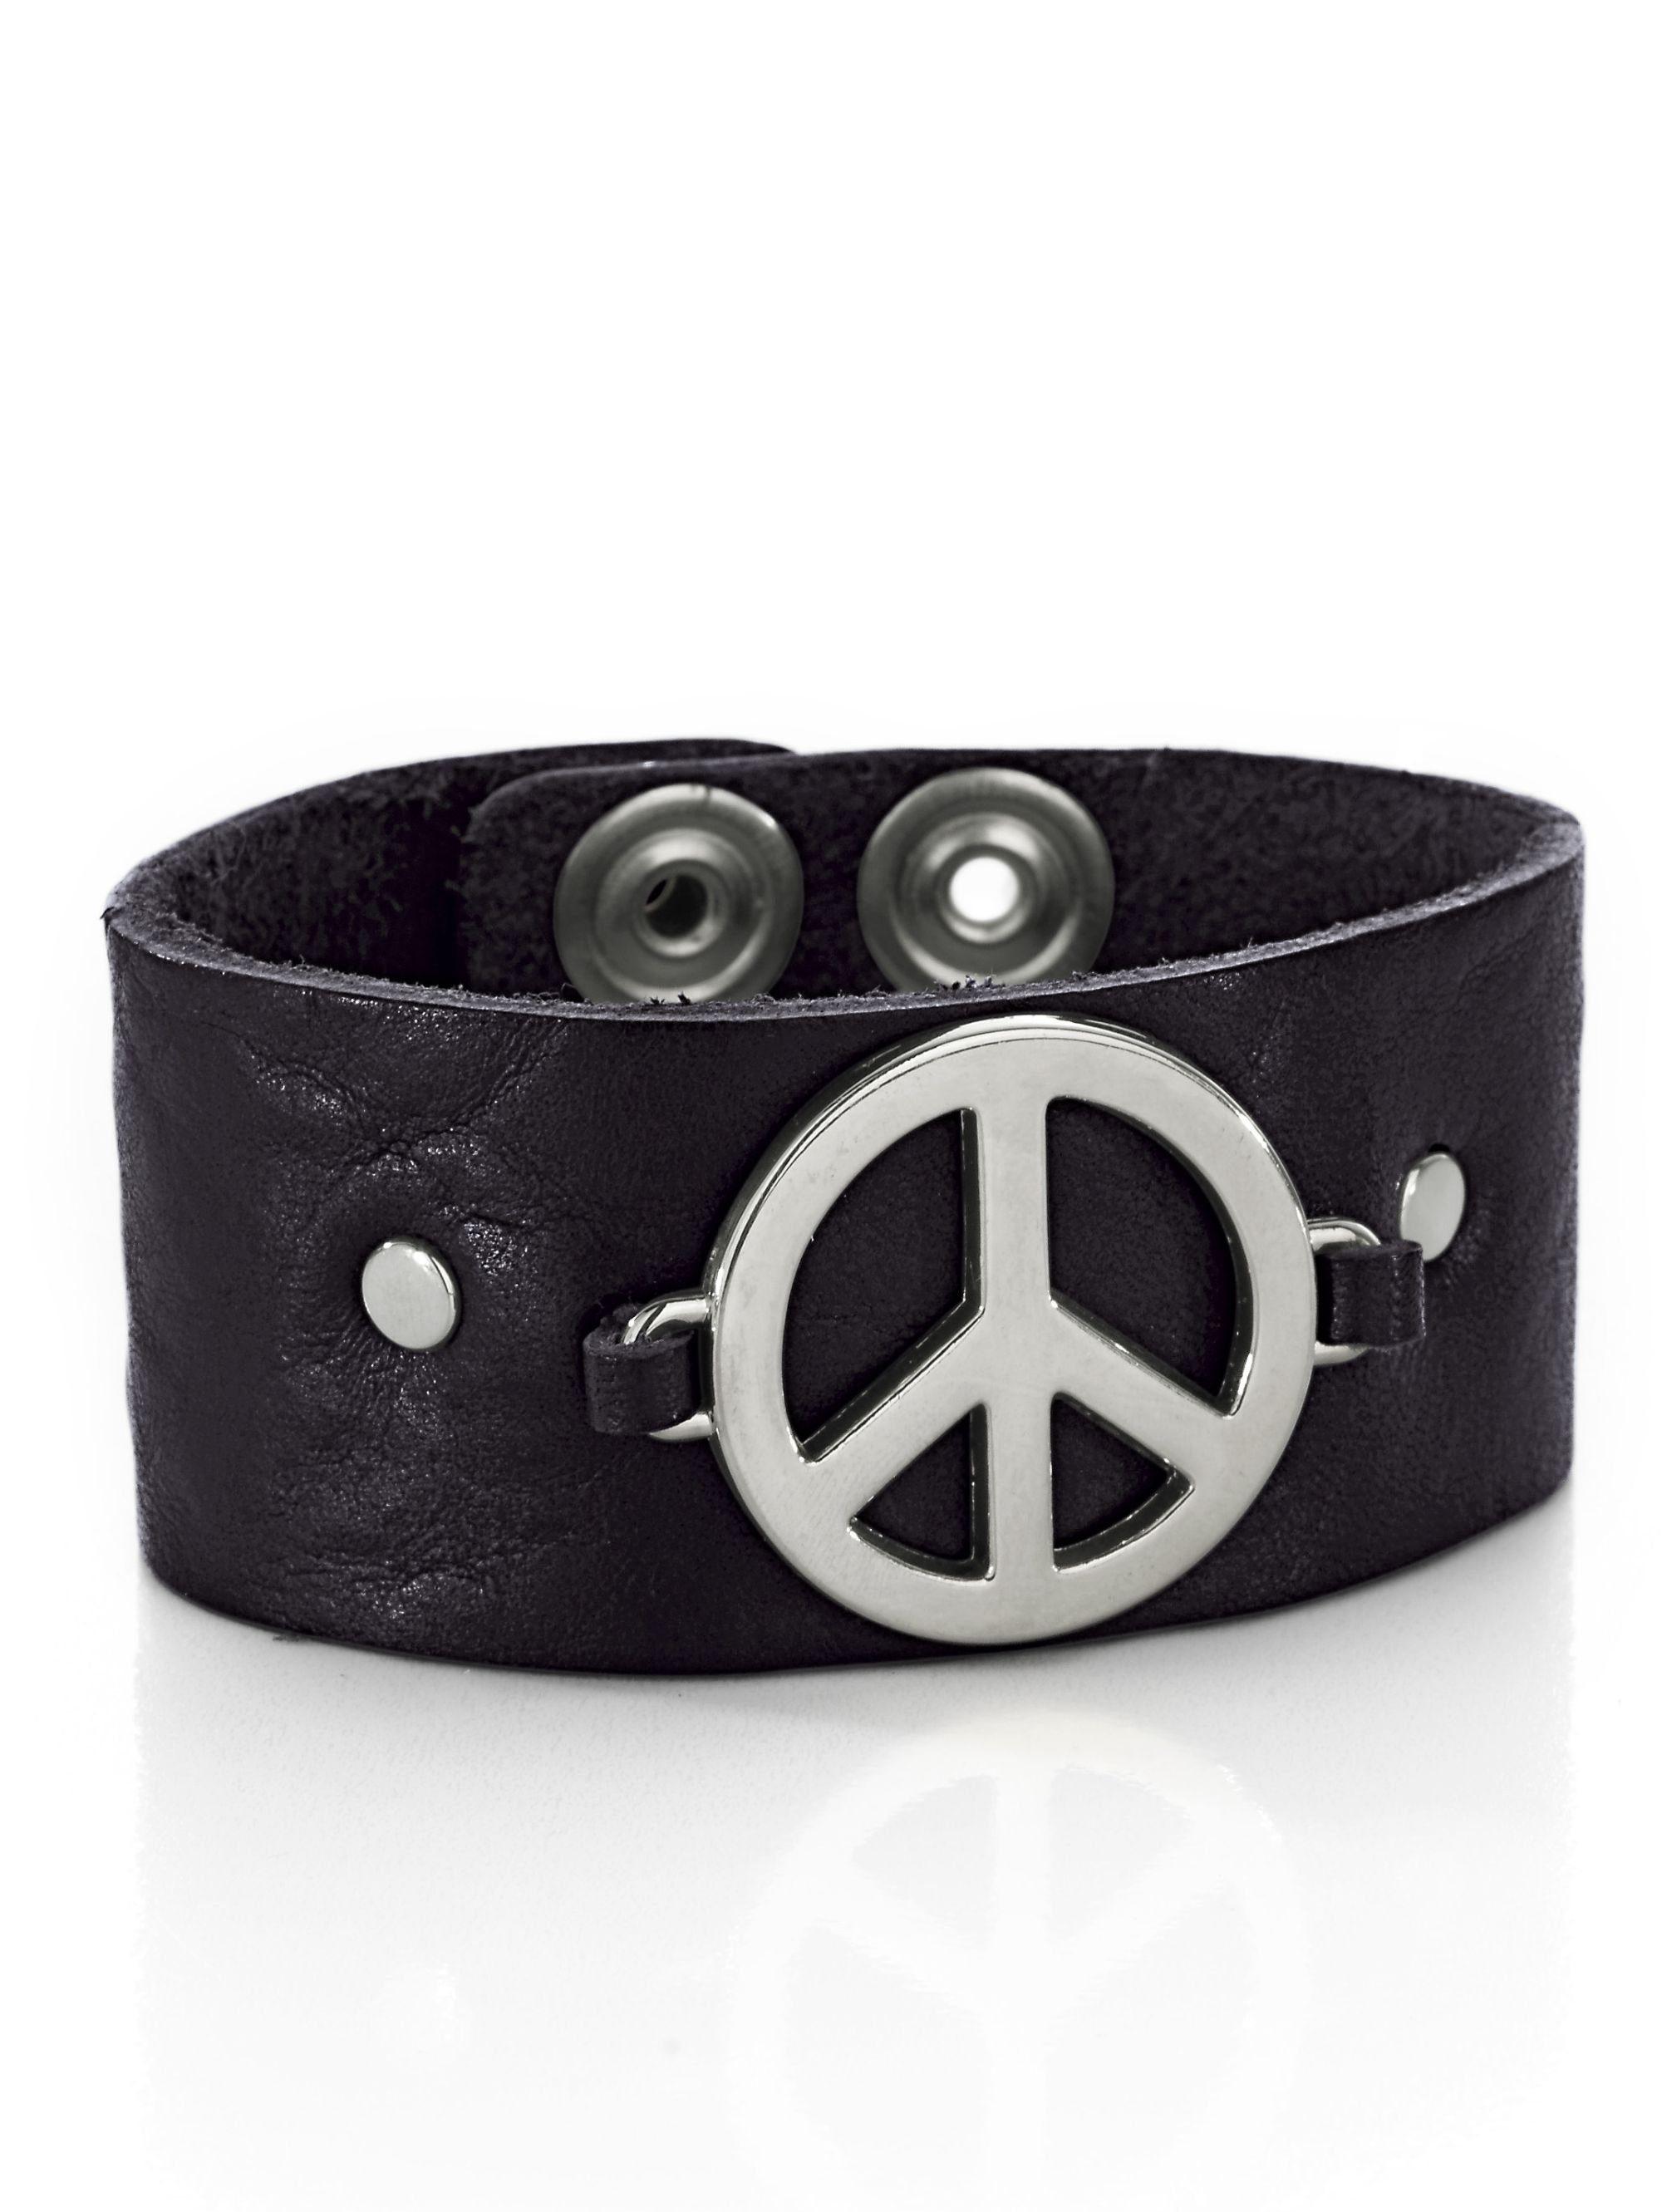 Alba Moda Armband mit 'Peace'-Symbol